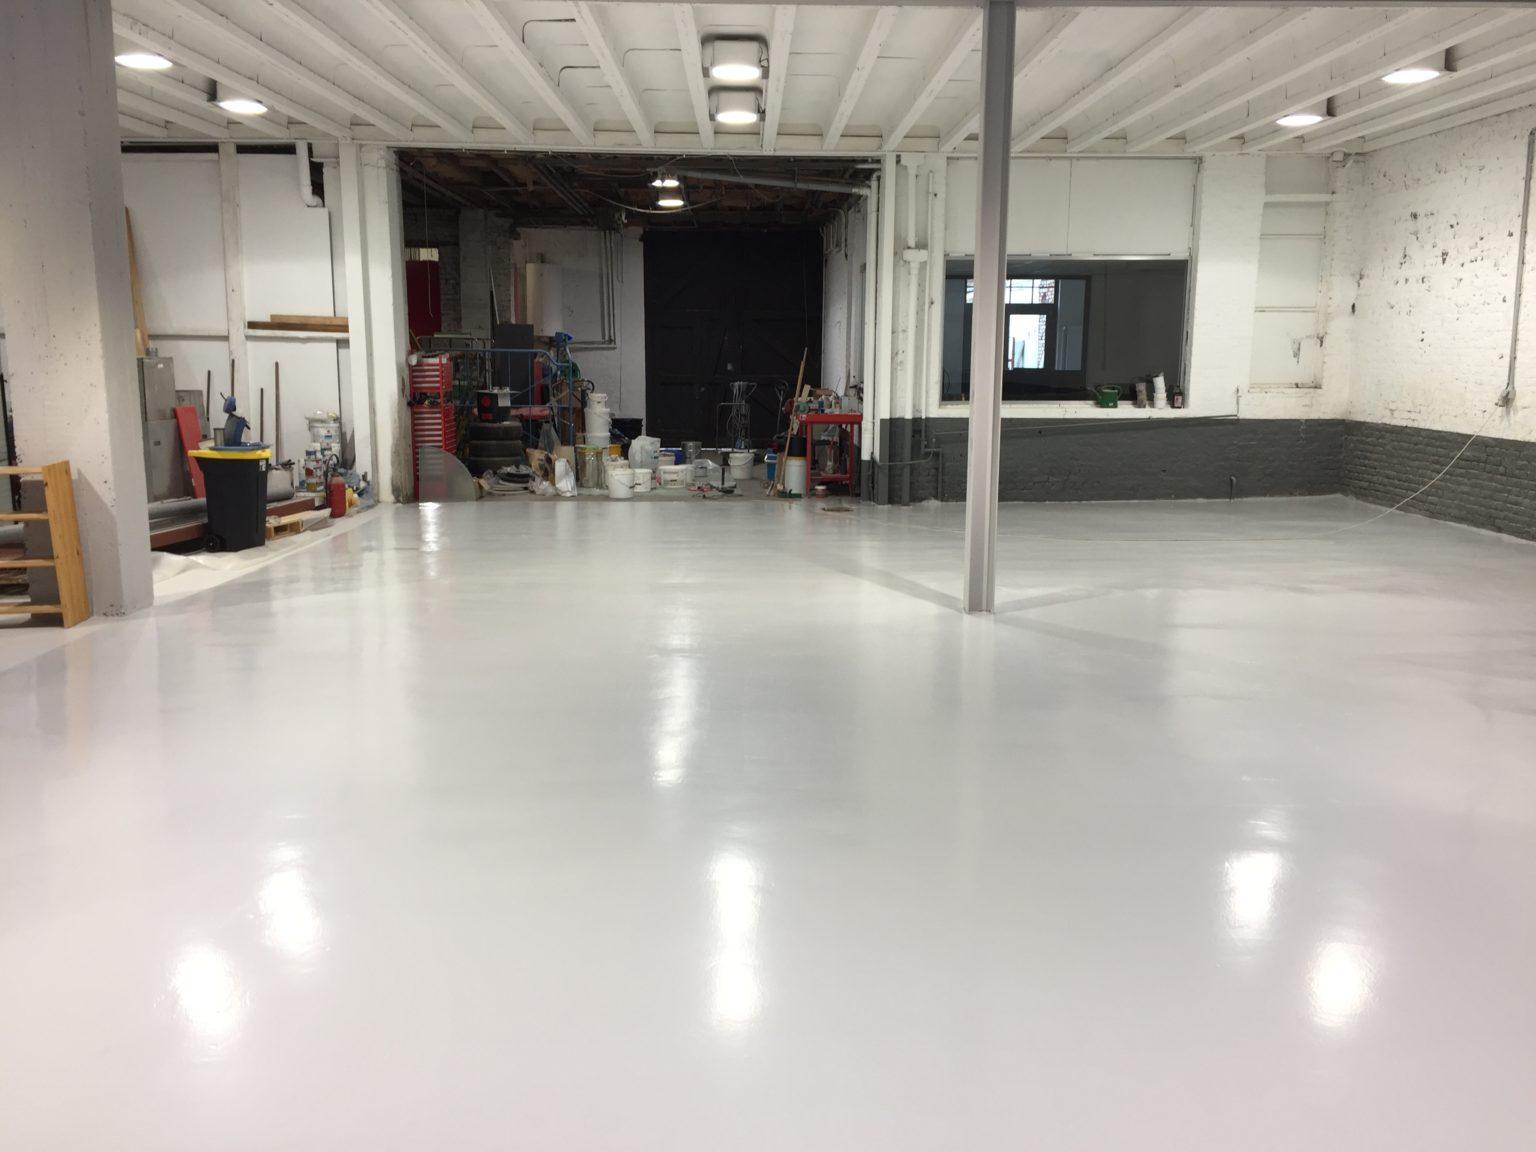 Epoxy coating garage